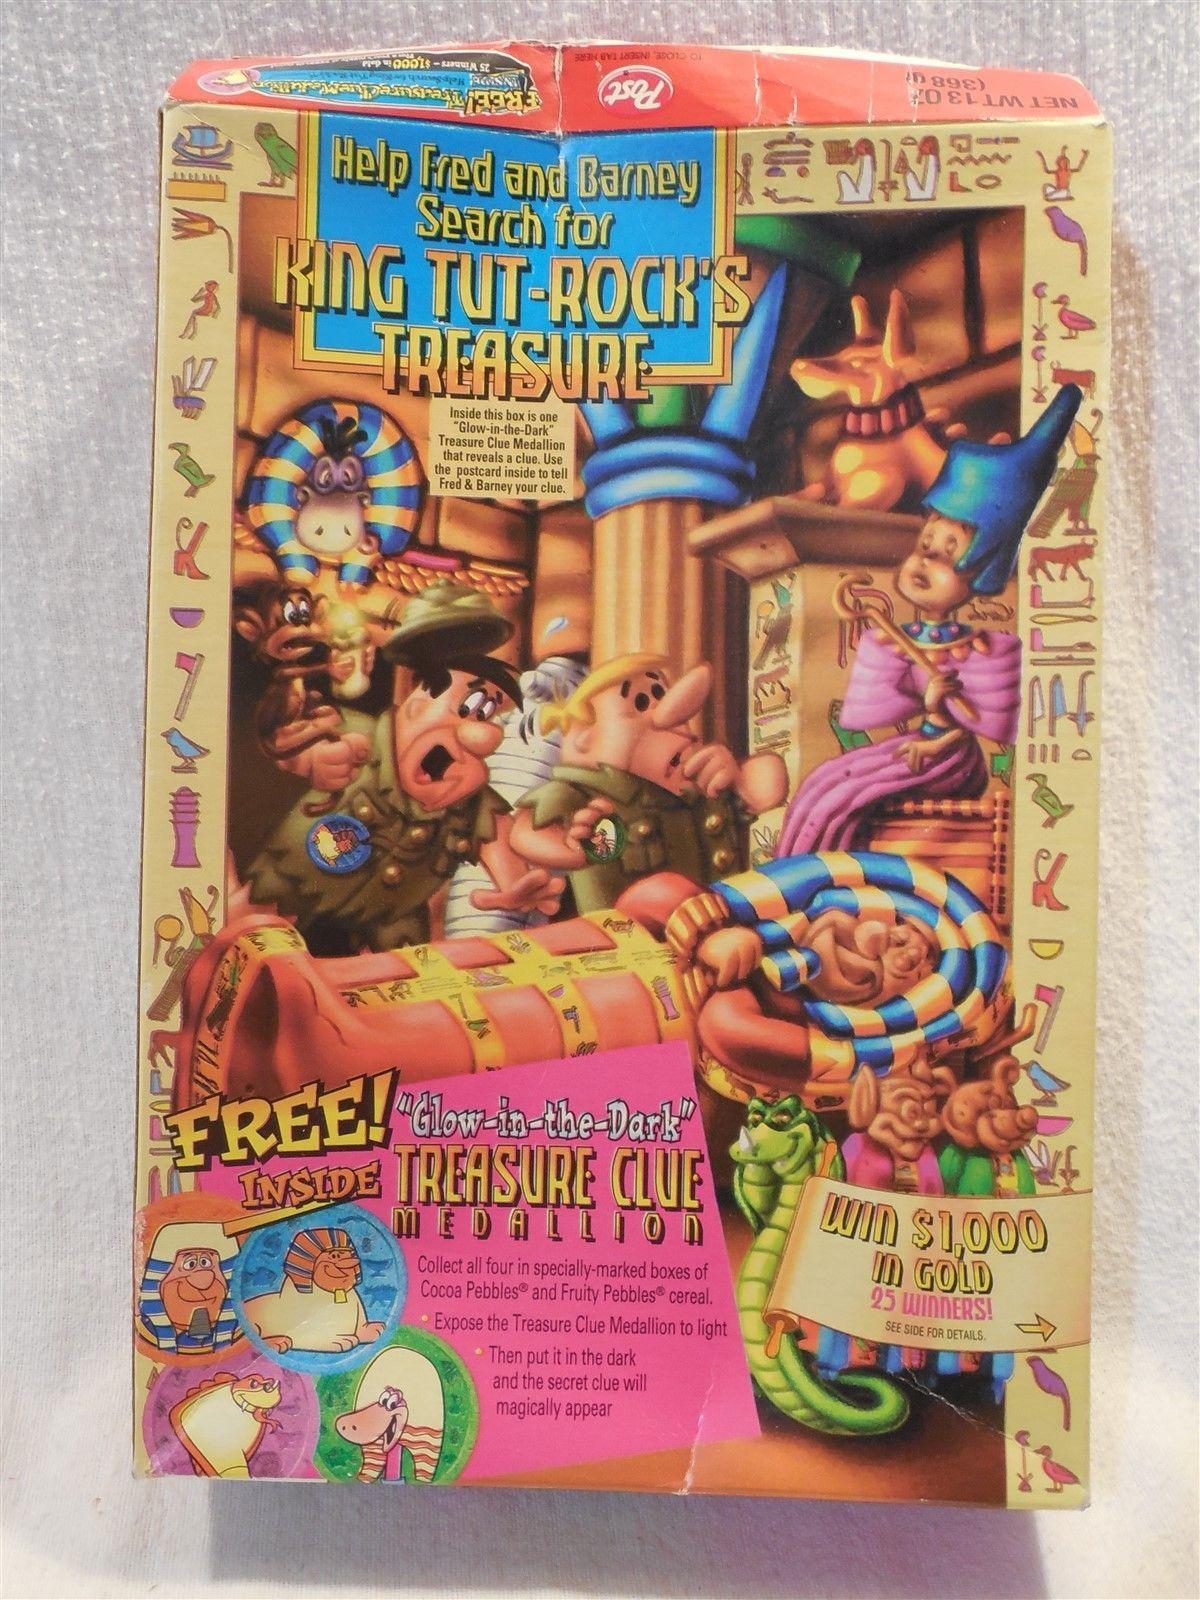 Flintstones 1996 Post Fruity Pebbles Cereal Box Treasure Clue Medallion Premium